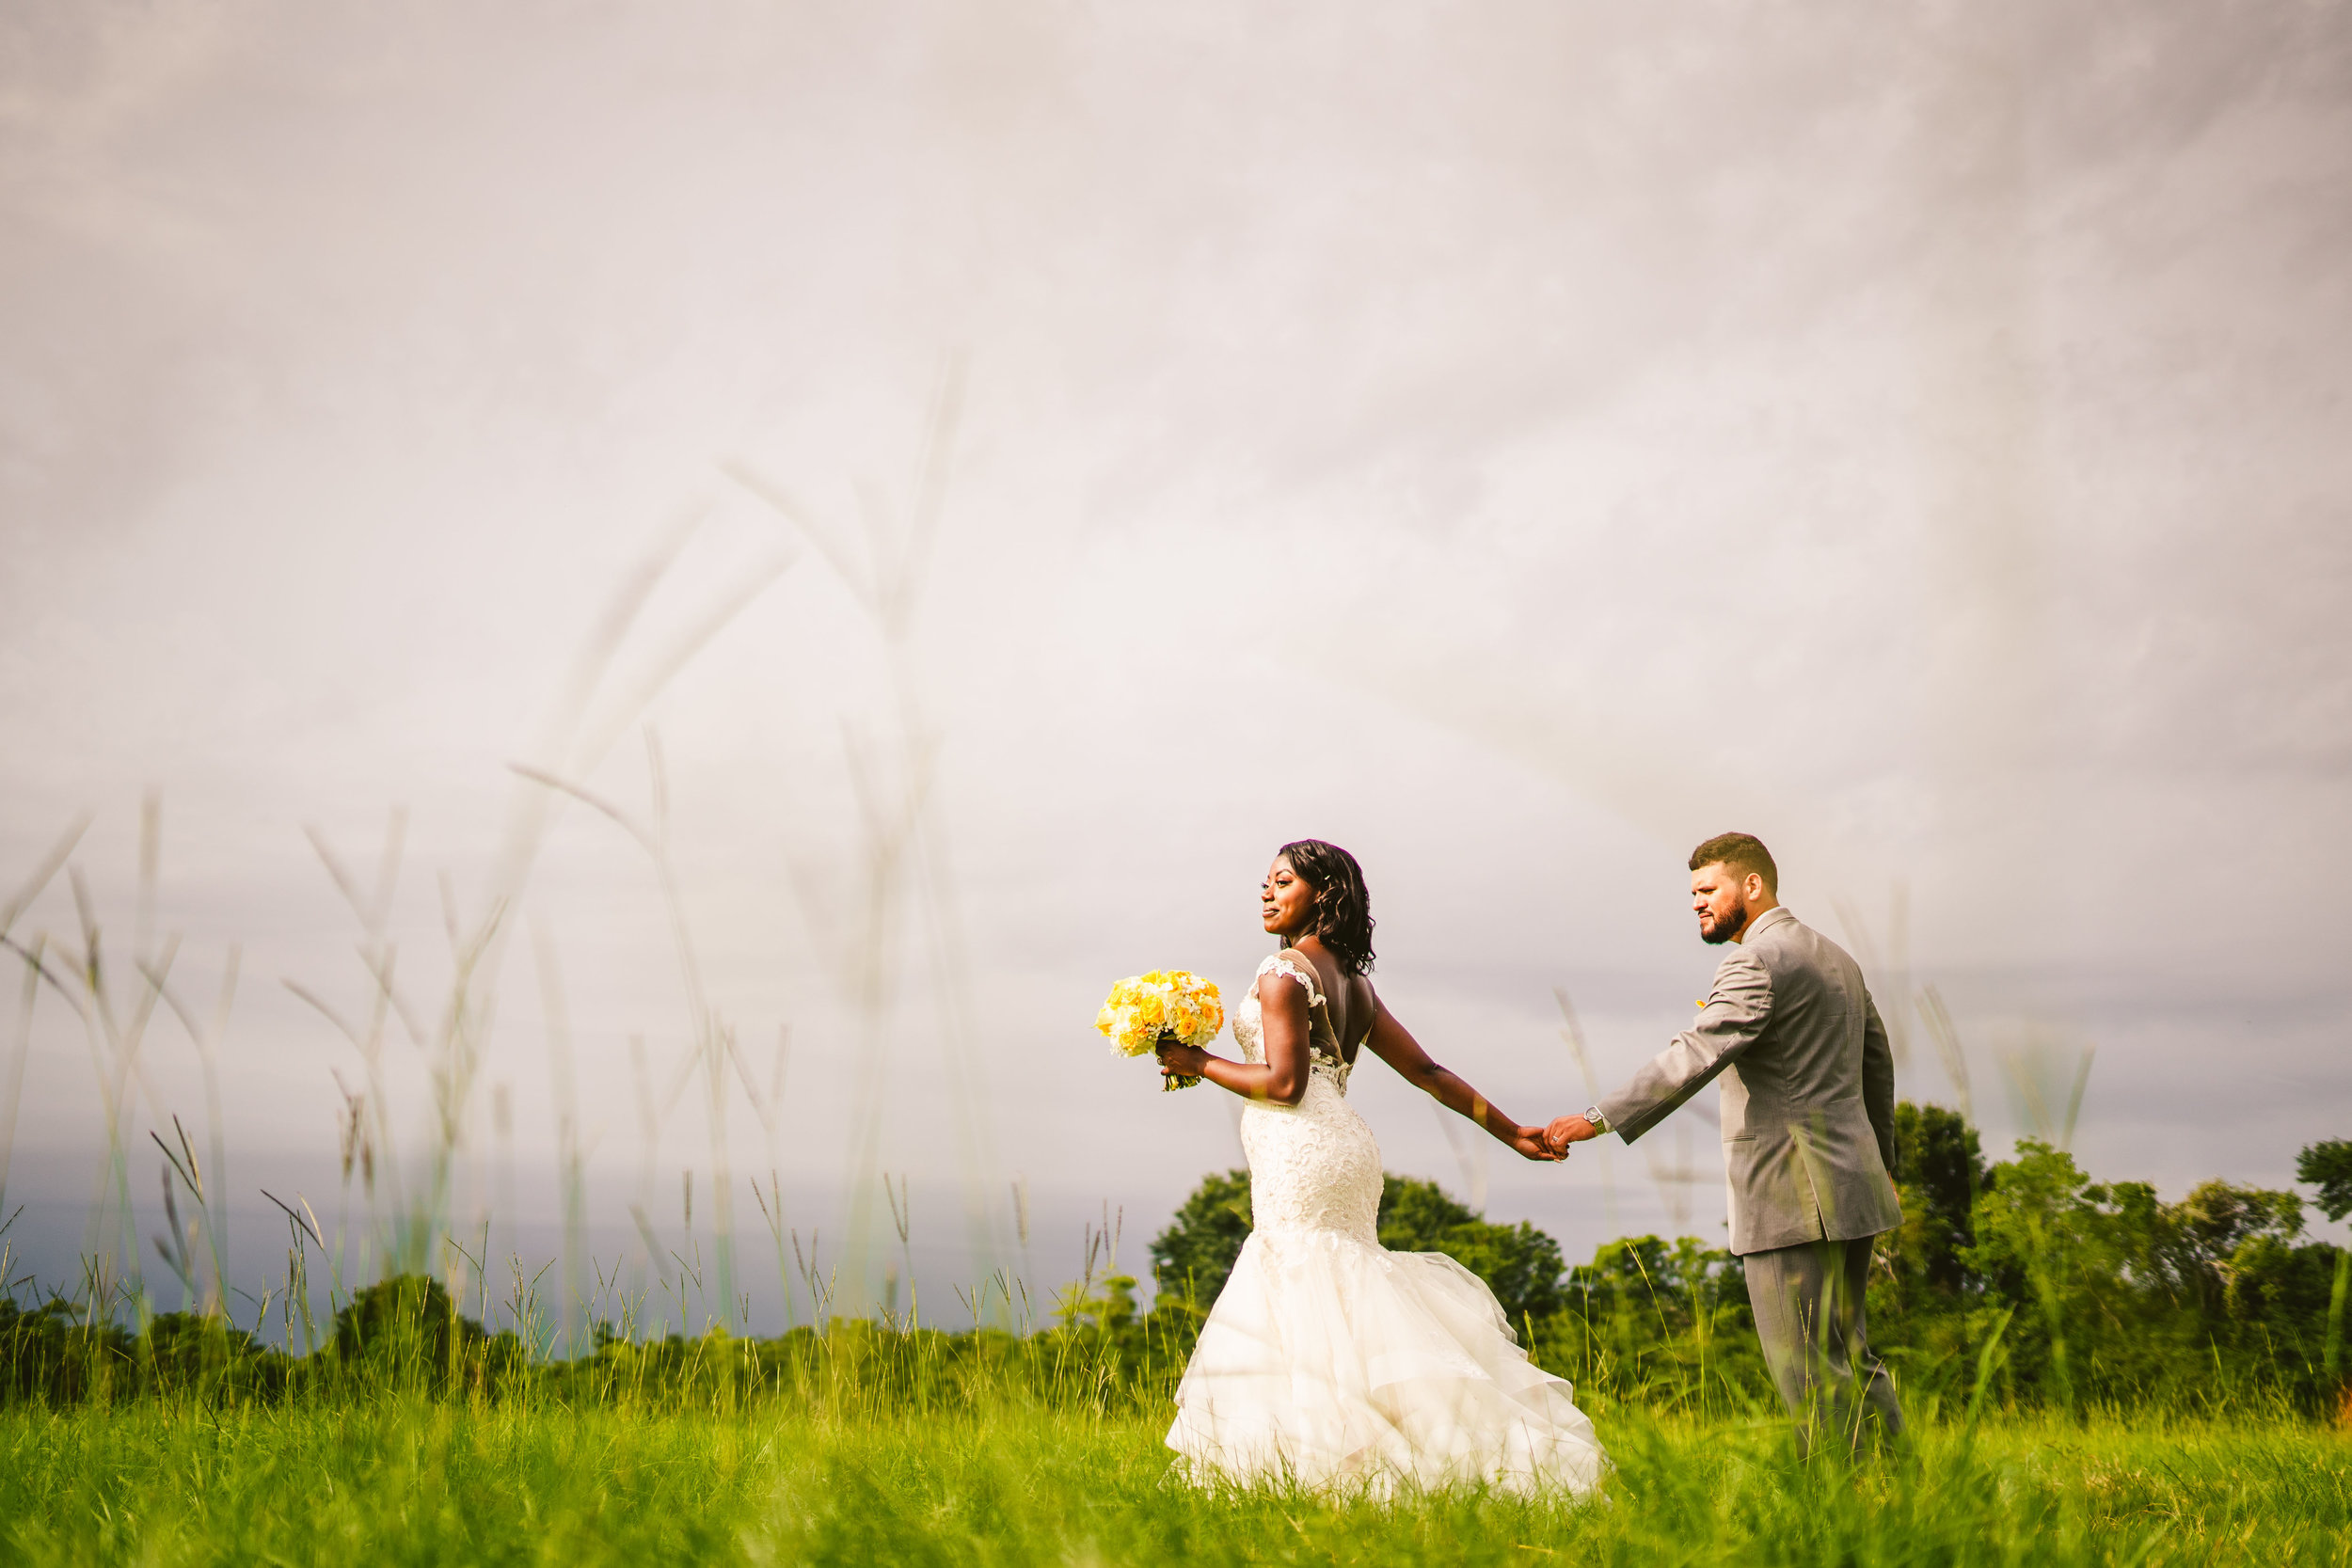 houston-wedding-photographer-photographers-photography-top-wedding-vendor-vendors-florist-floral-dress-gown-suit-tie-bride-groom-make-up-artists-artist-creative-photojournalism-night-portraits-moffit-oaks-oak-event-tomball-texas-tx.jpg